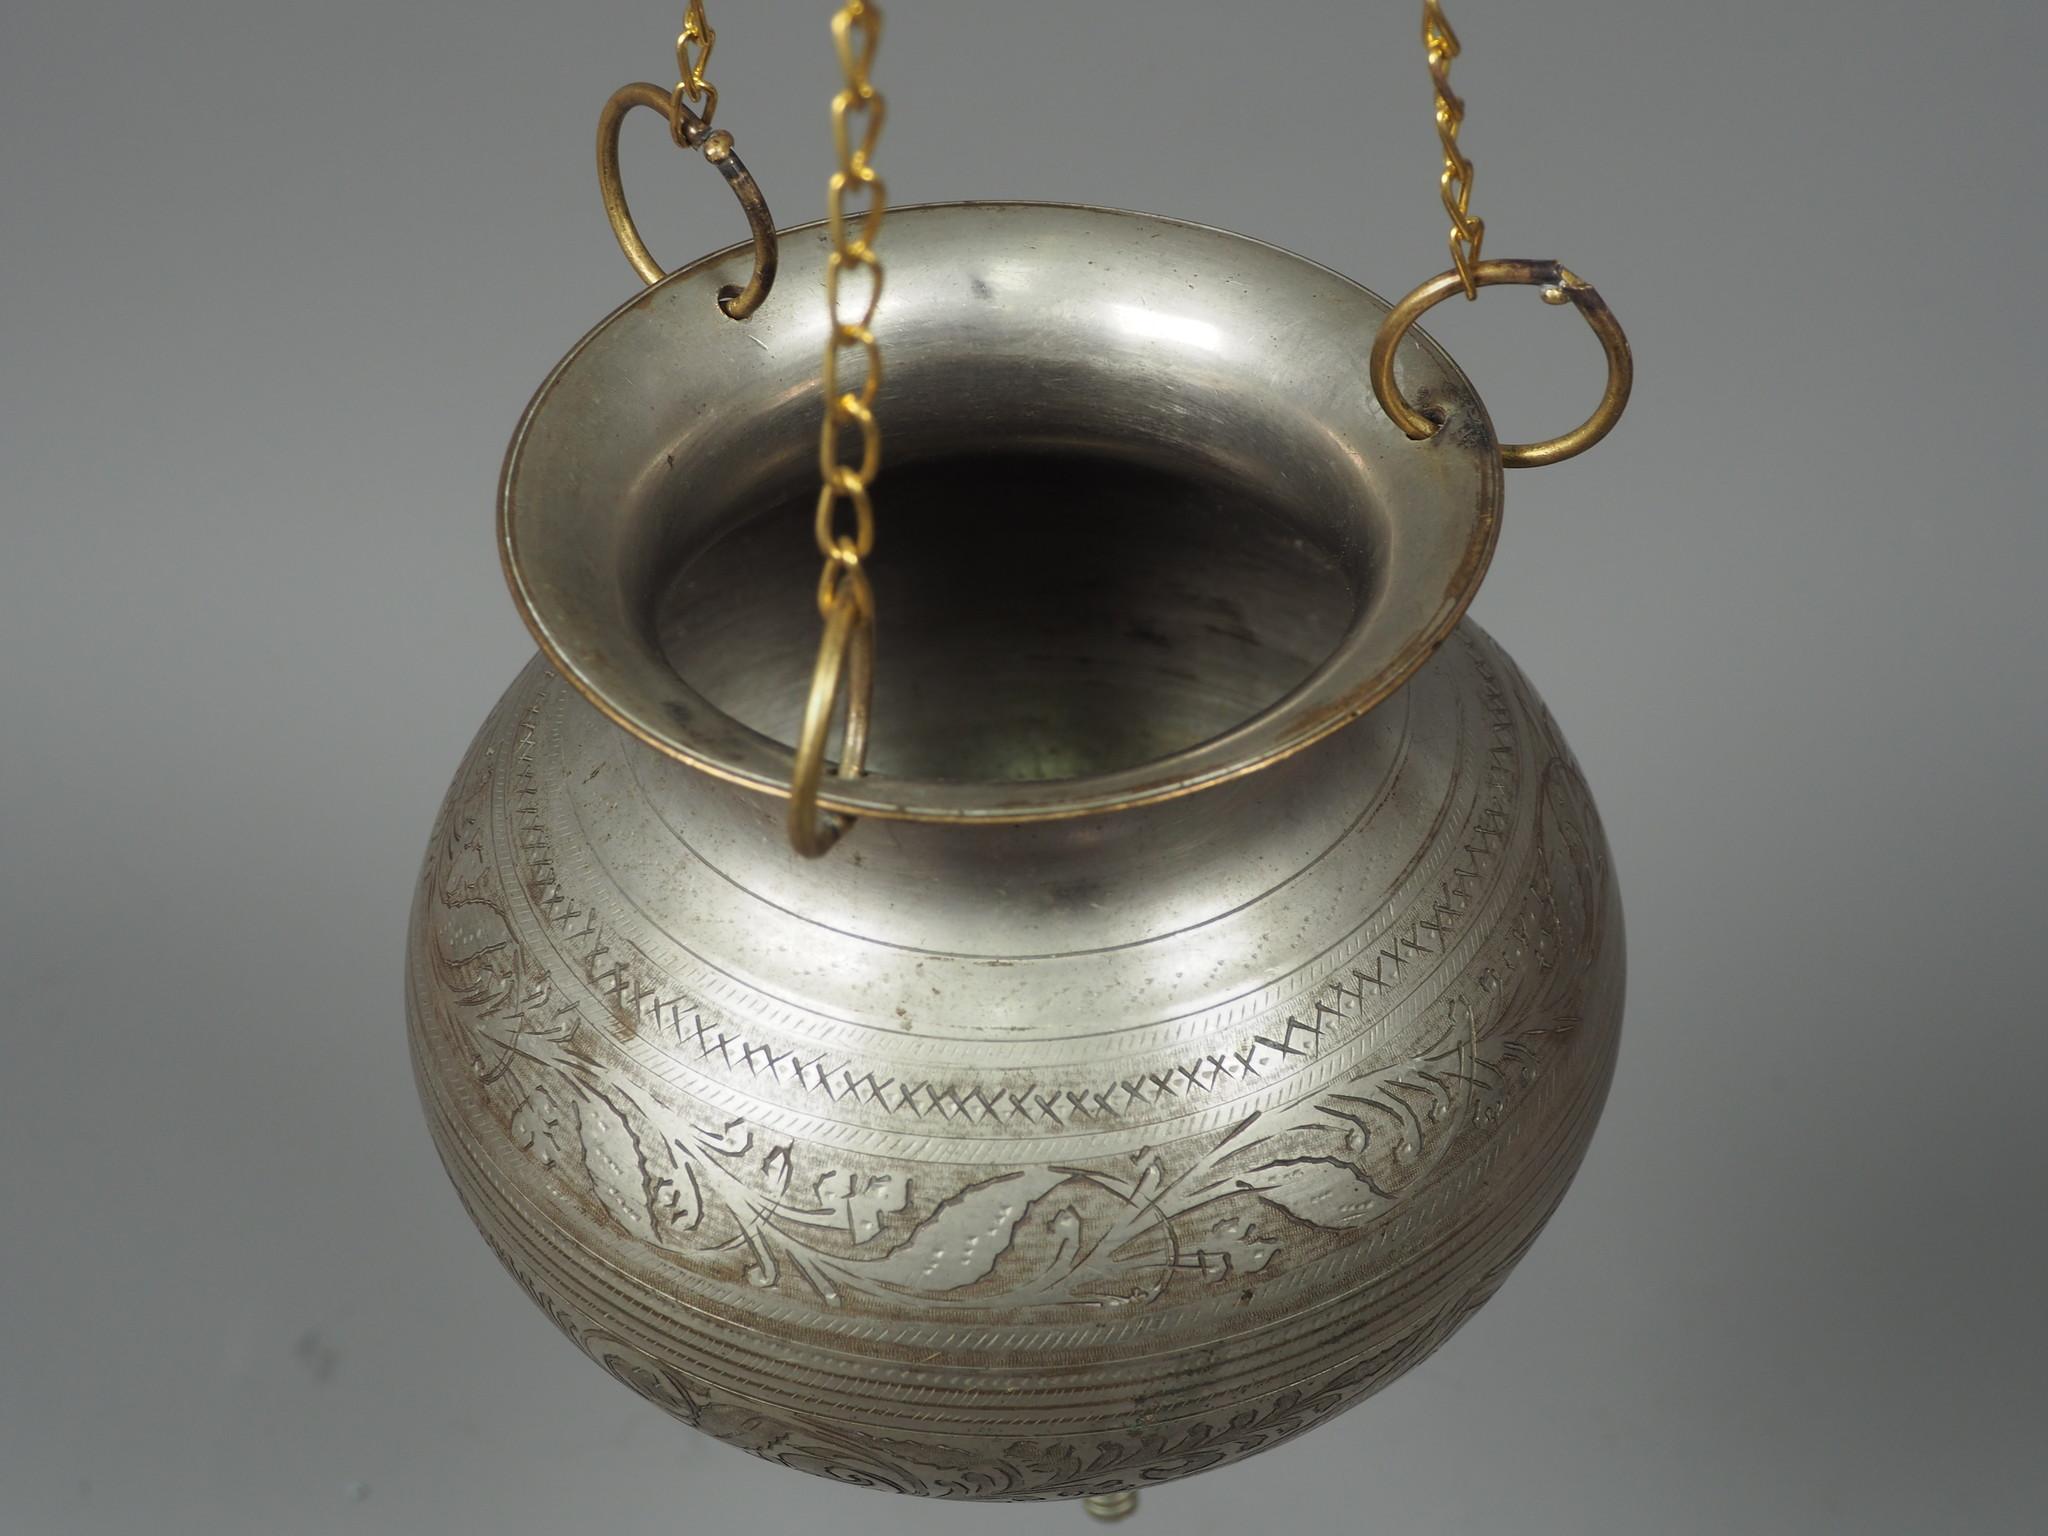 antique solid copper orient Ayurvedic Shirodhara Panchakarma oil therapy Yoga Dhara vessel Patra india -No:  21/14